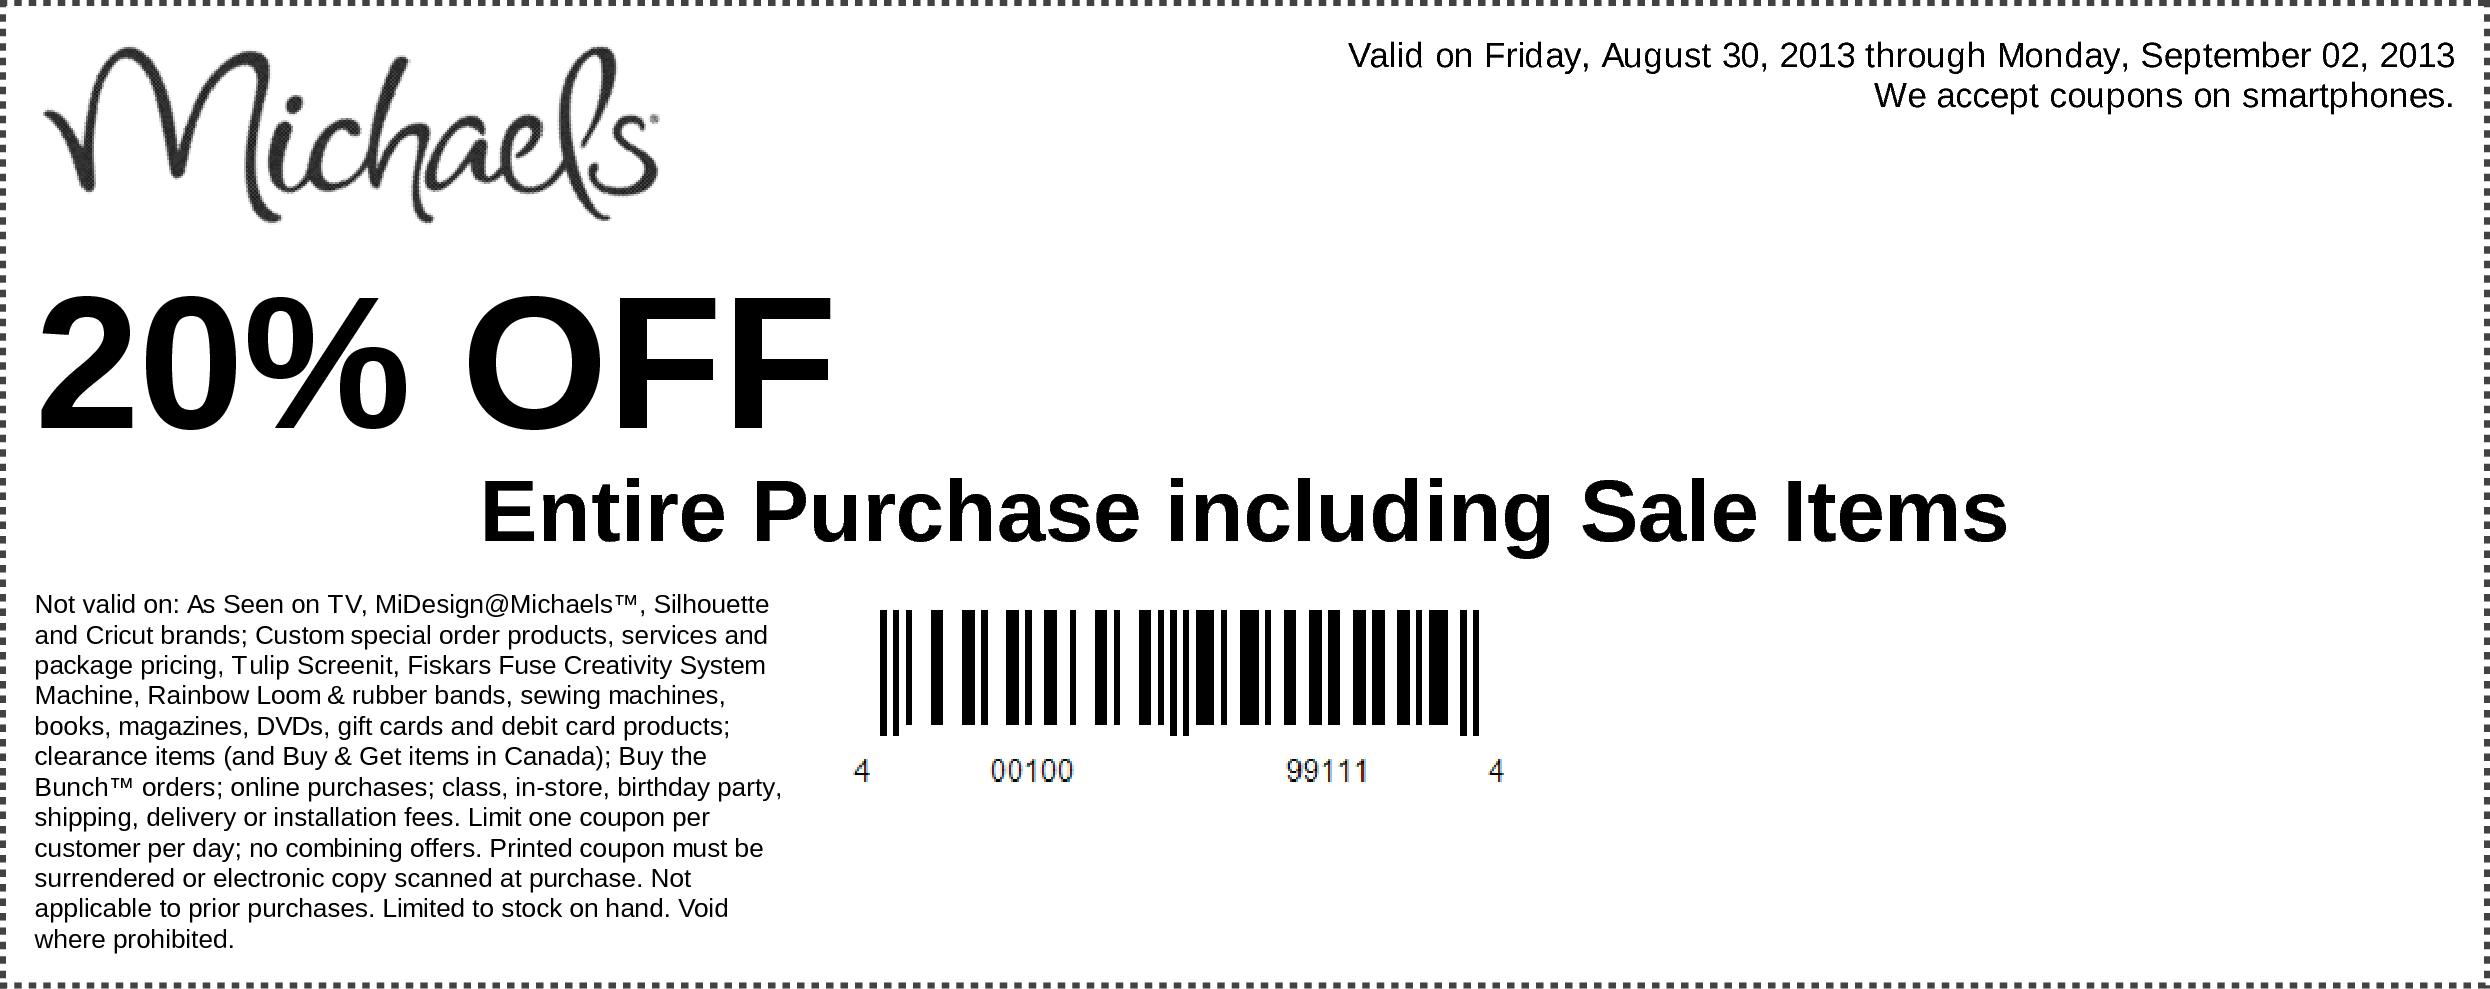 Labor day printable coupons